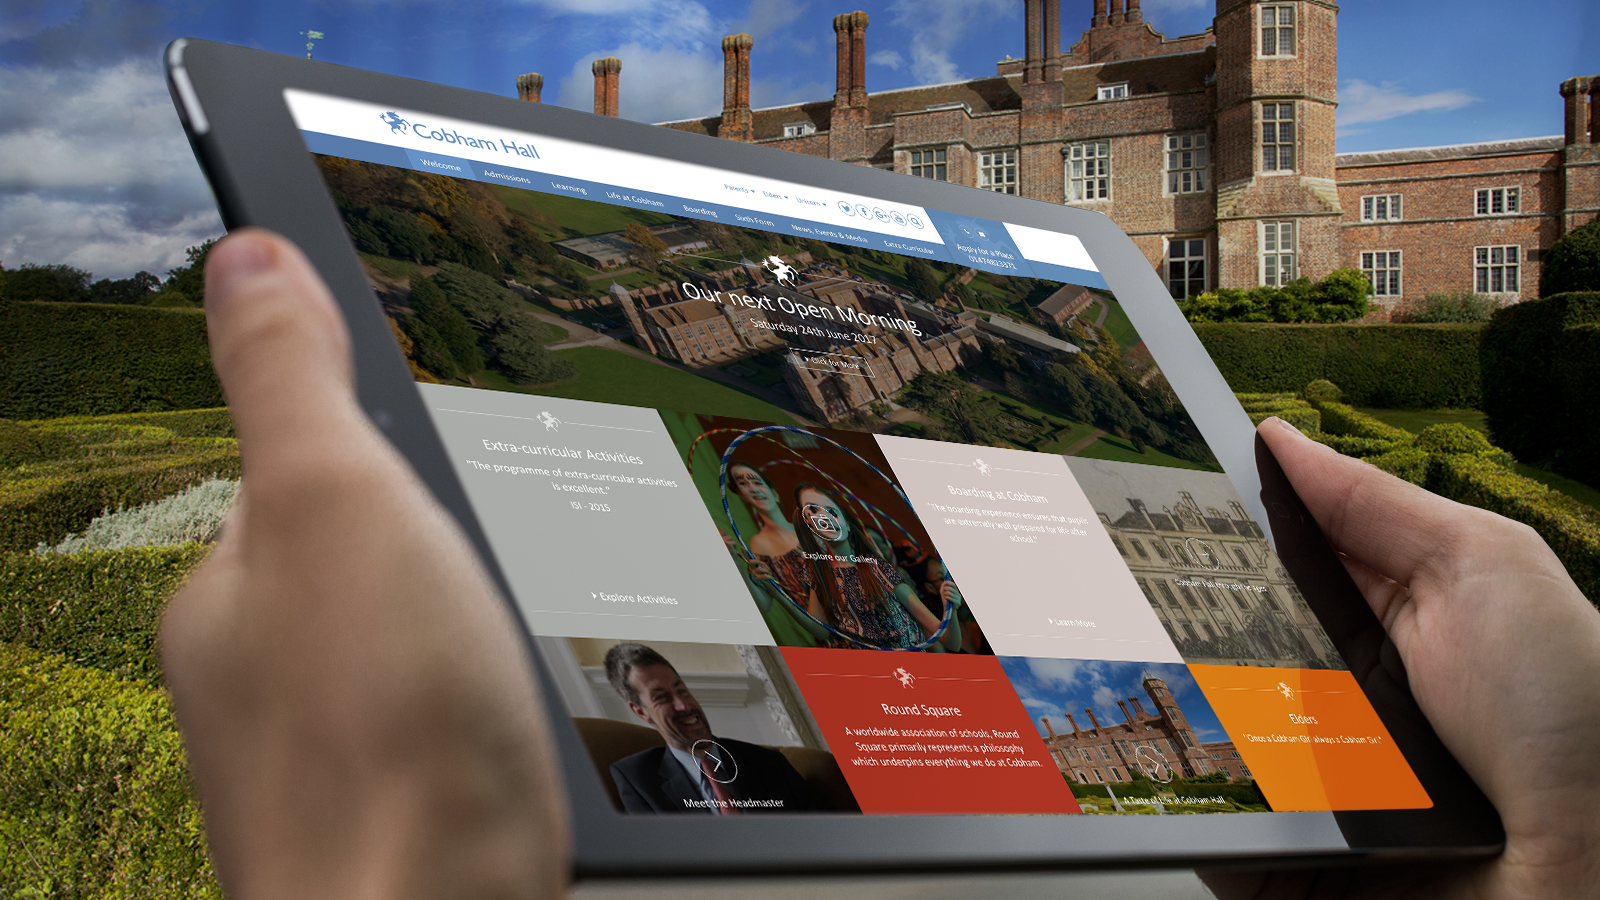 Chobham Hall school website design for schools